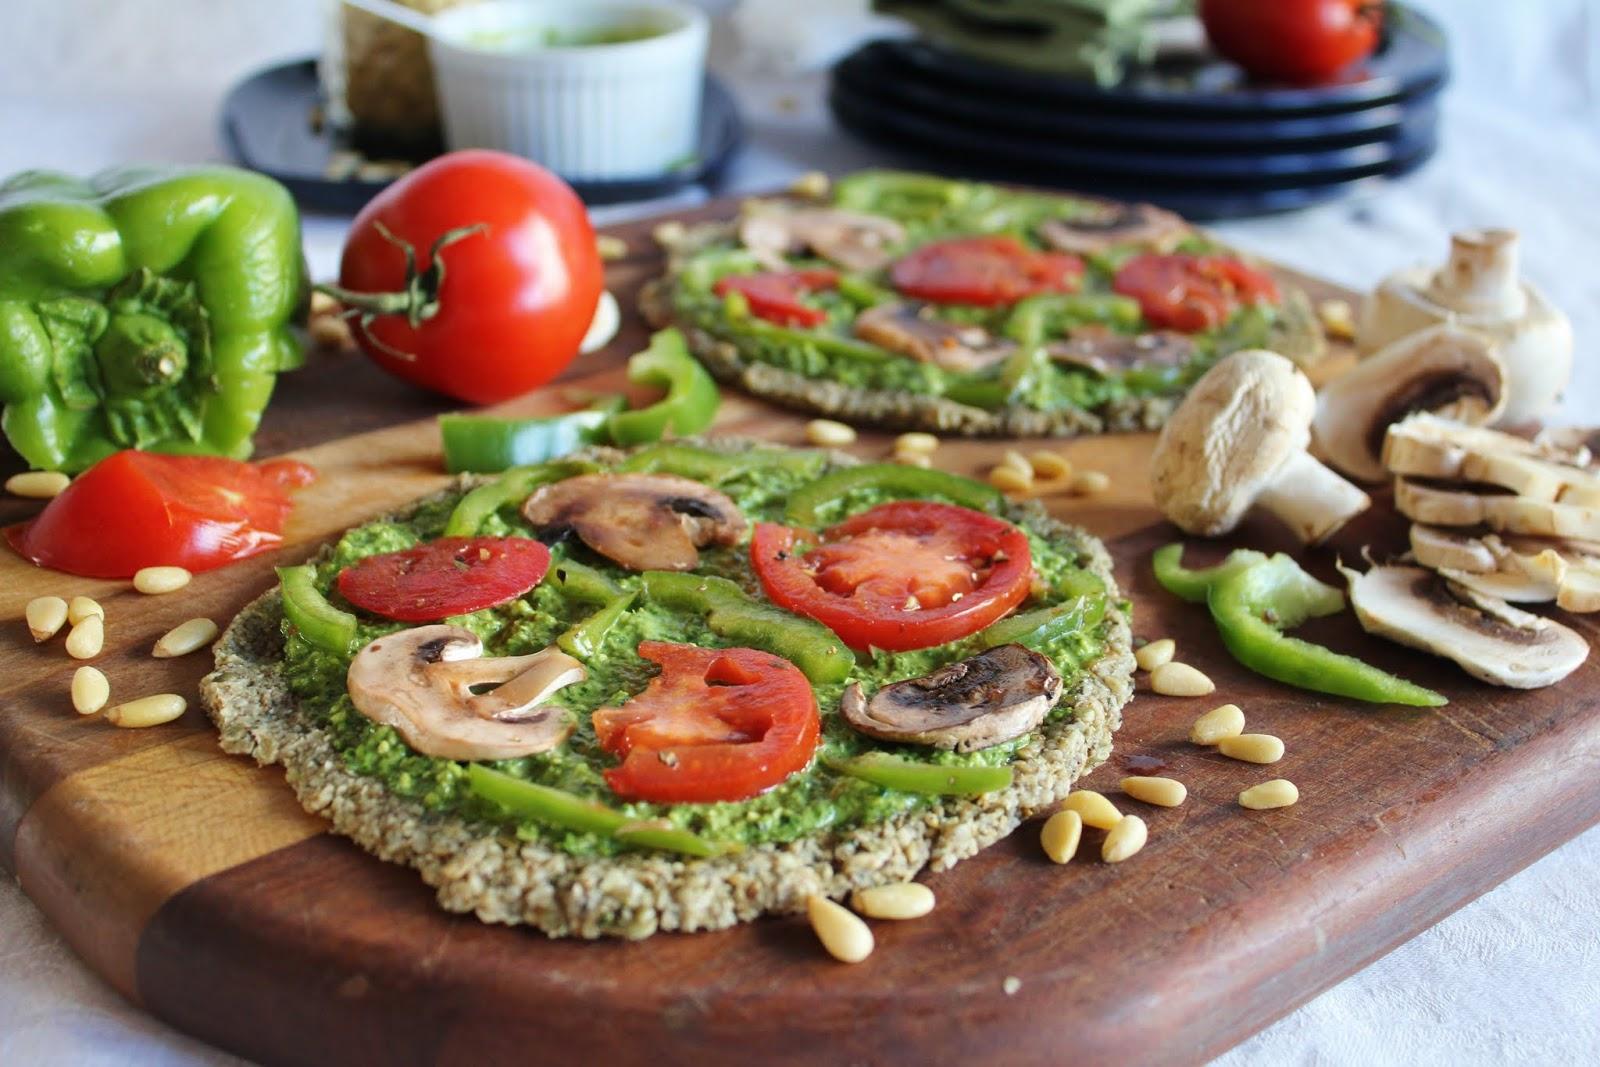 Bild: Rohkostpizza belegt mit Pesto, Tomaten, Champignons und Peperoni.